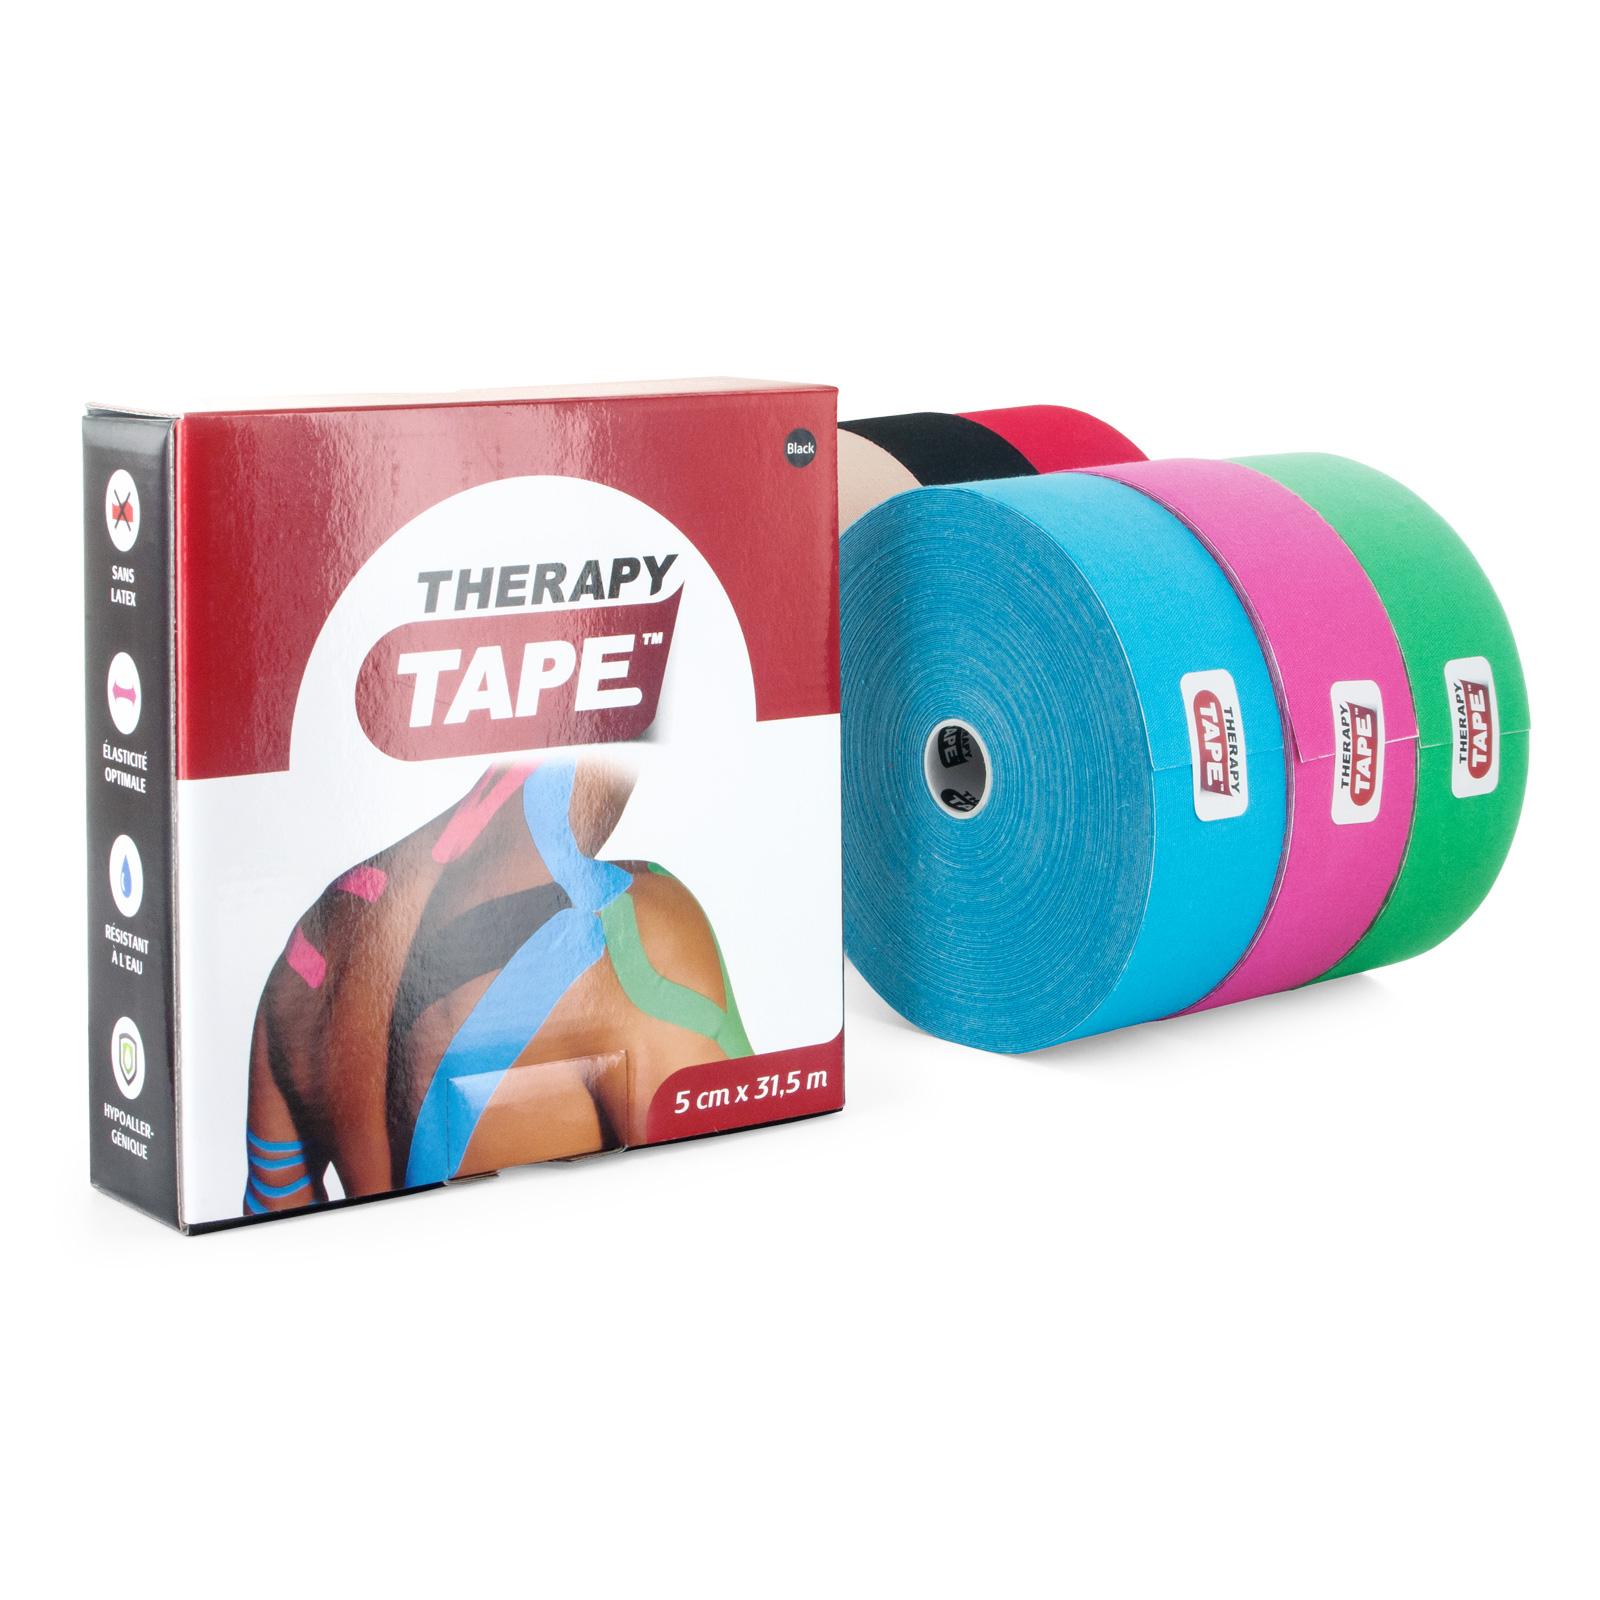 Therapy-Tape™ jumbo Taping